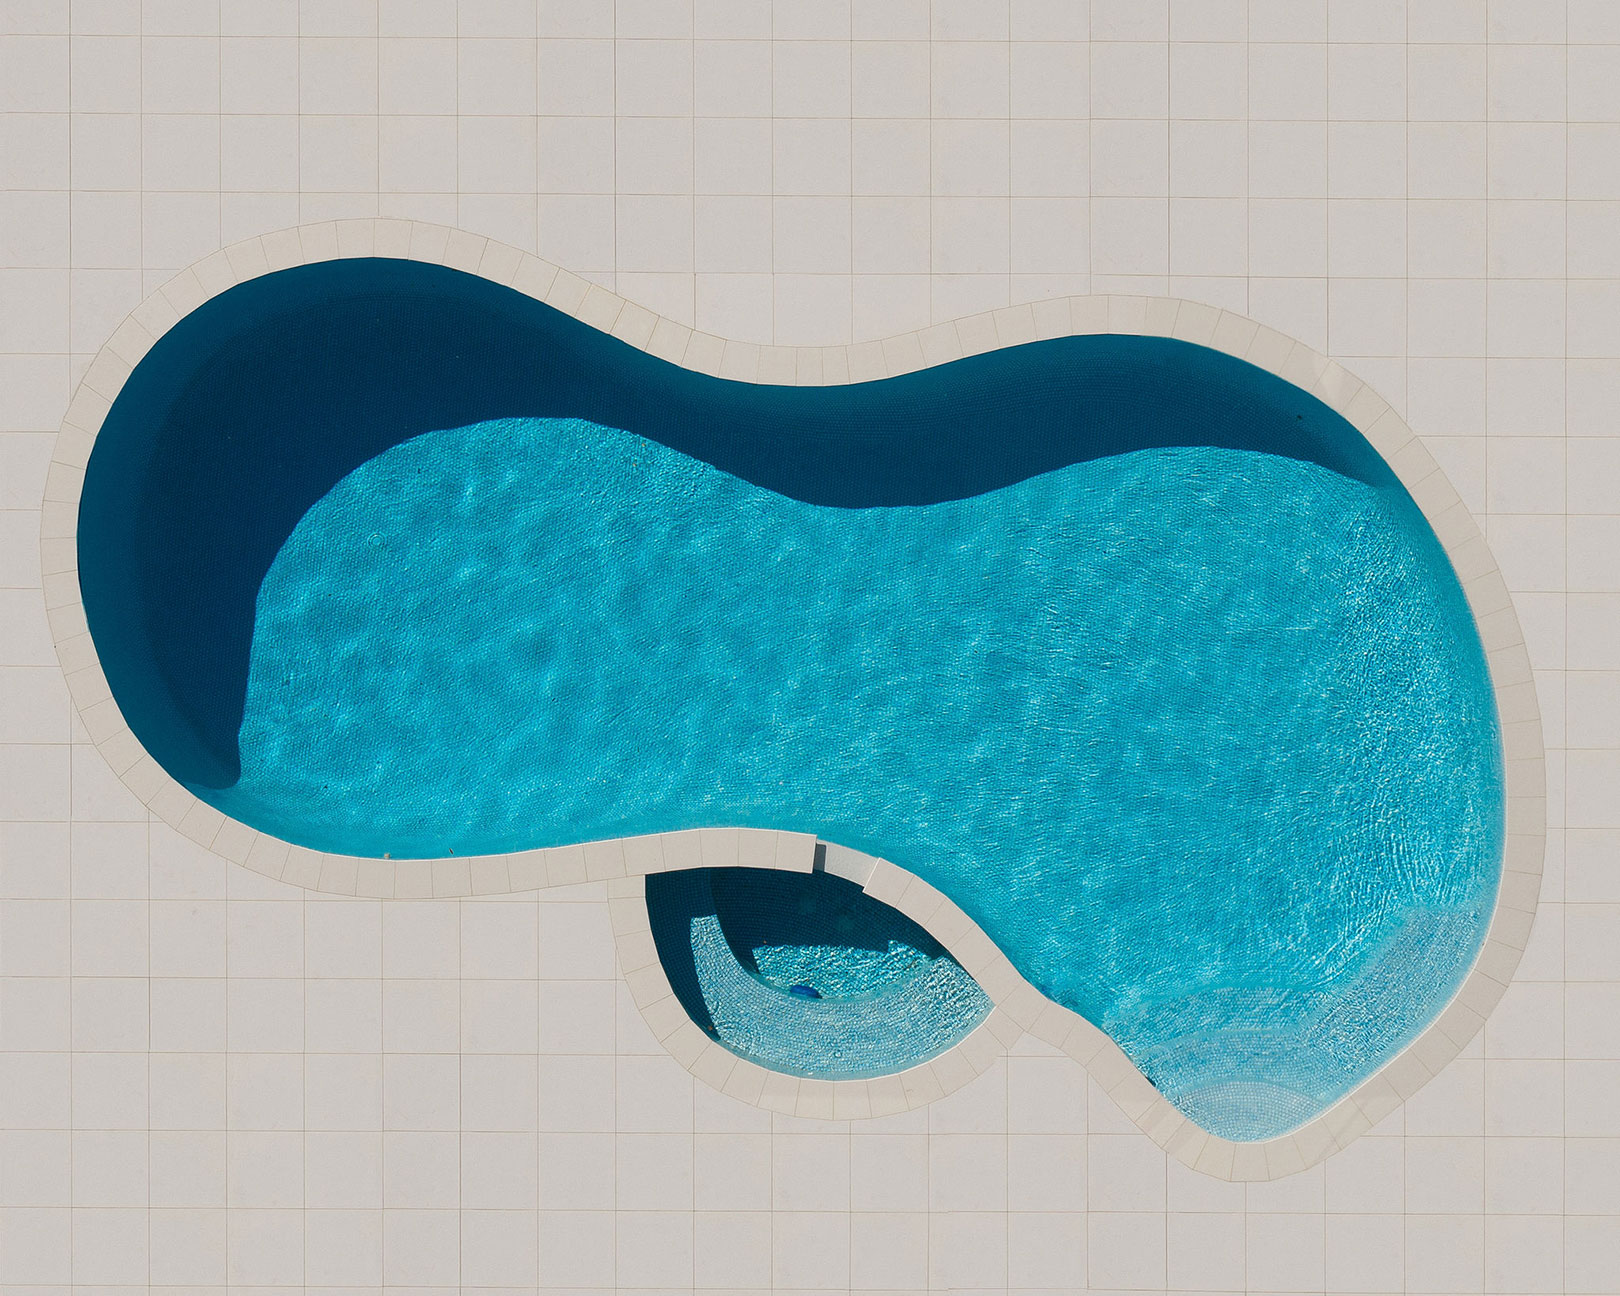 Pools from above – Brad Walls fotografiert Schwimmbecken